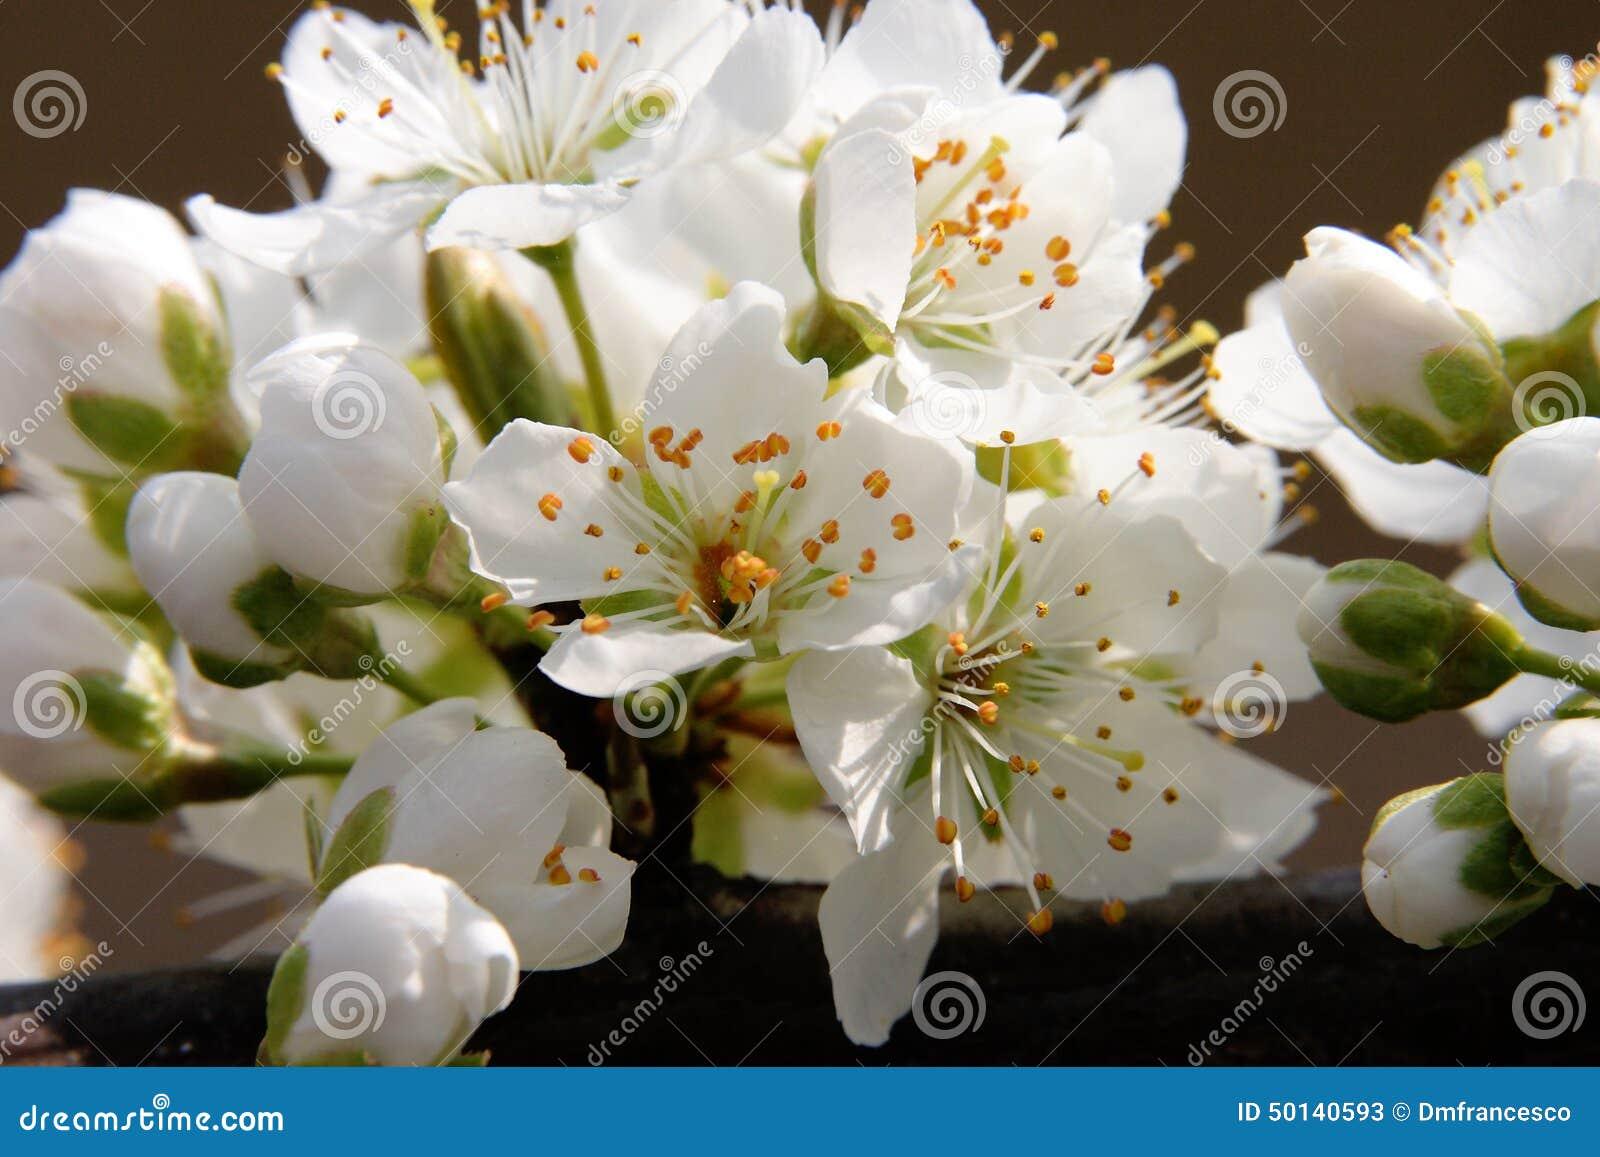 Flowers Garden Stock Image